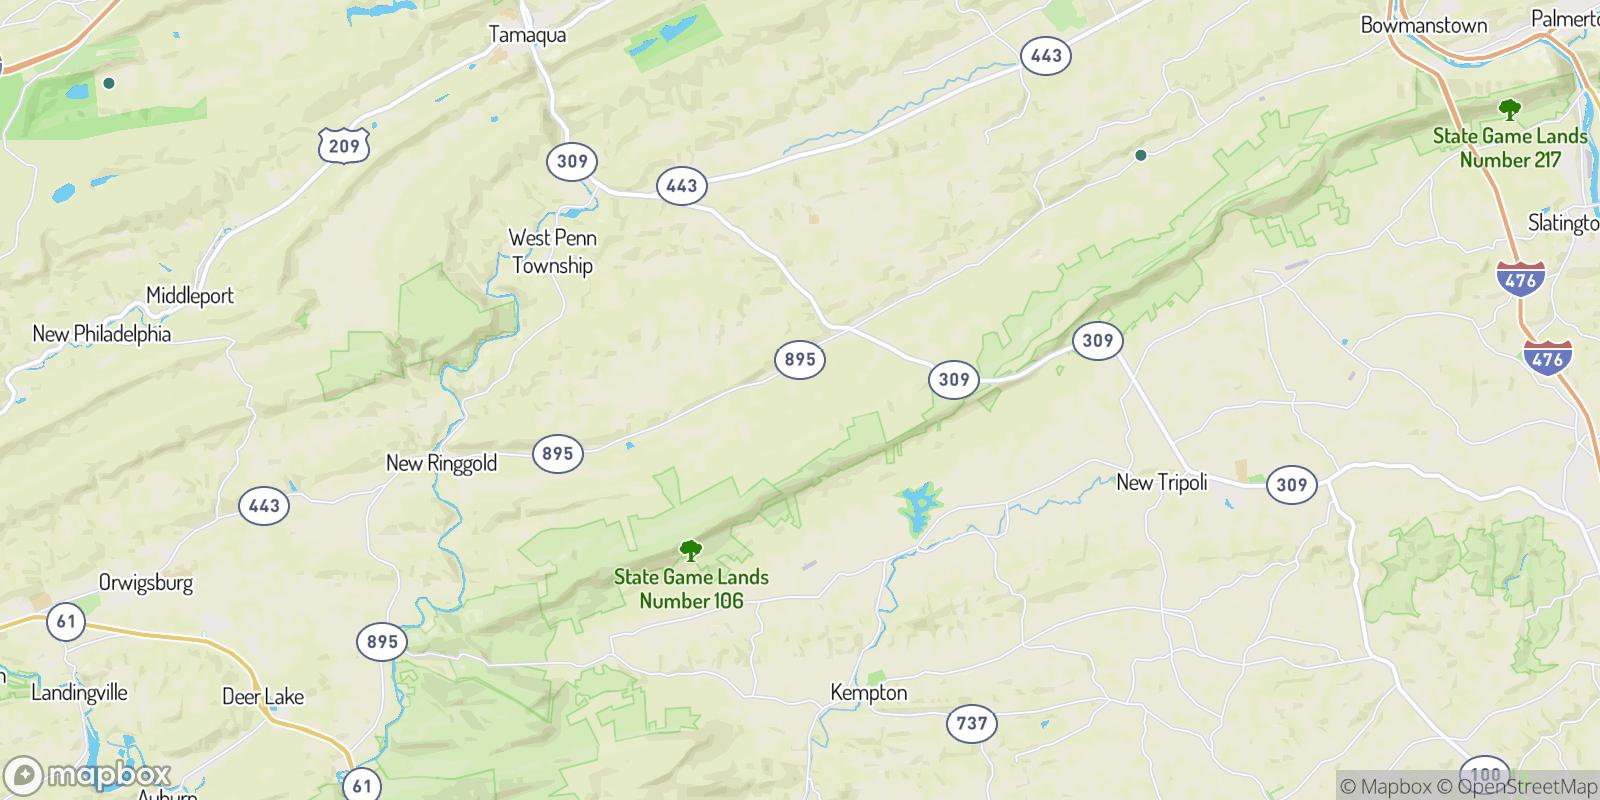 The best camping near Dorset, Pennsylvania